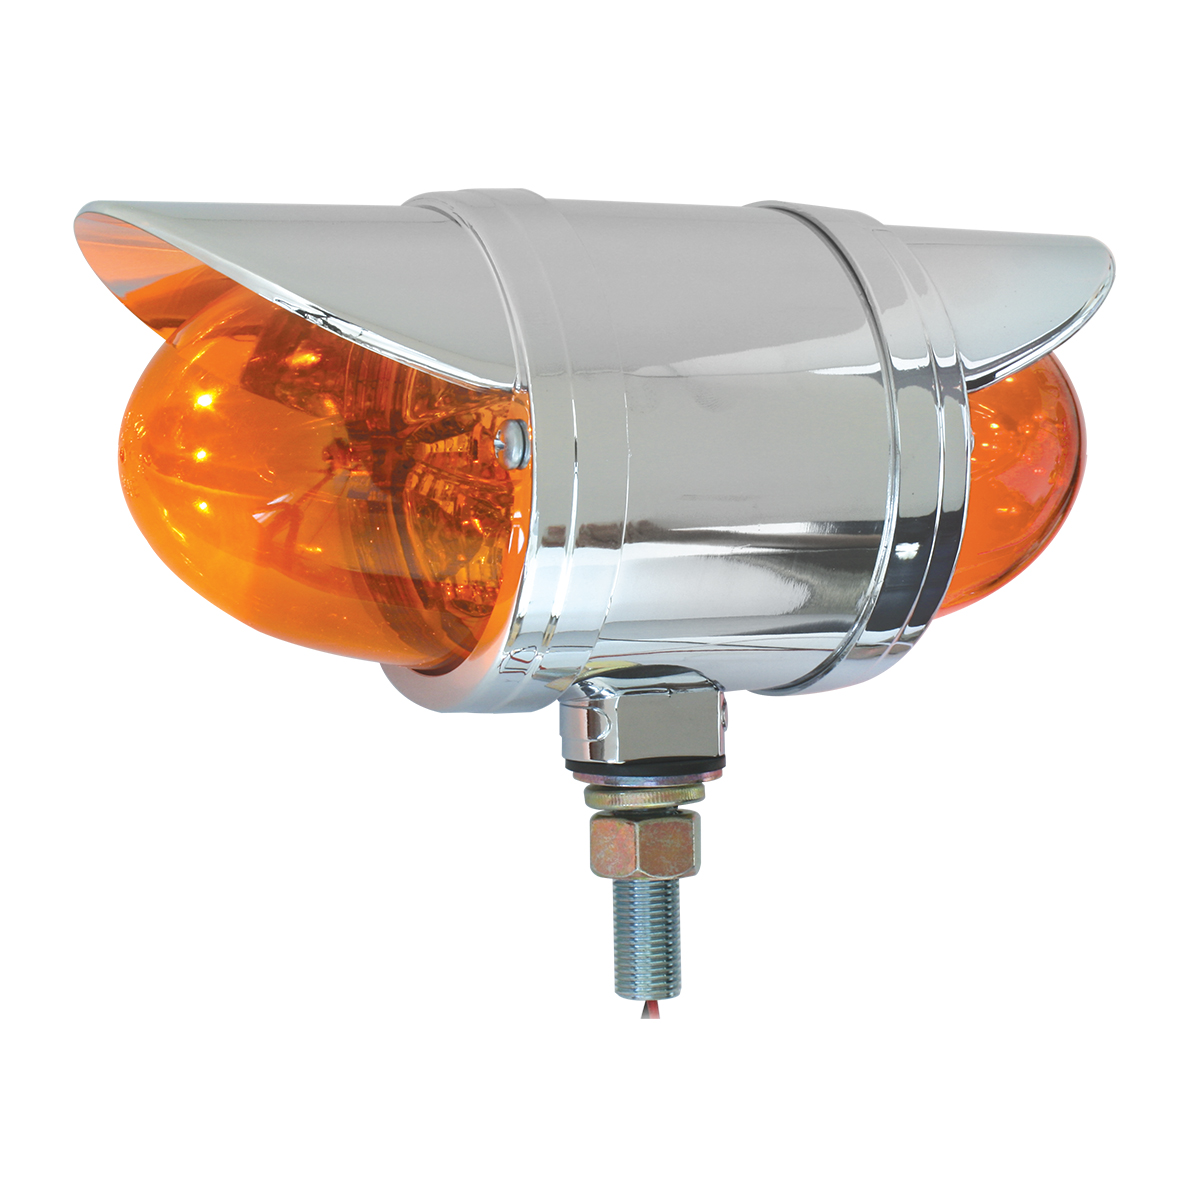 77932 Double Face Spyder LED Pedestal Light